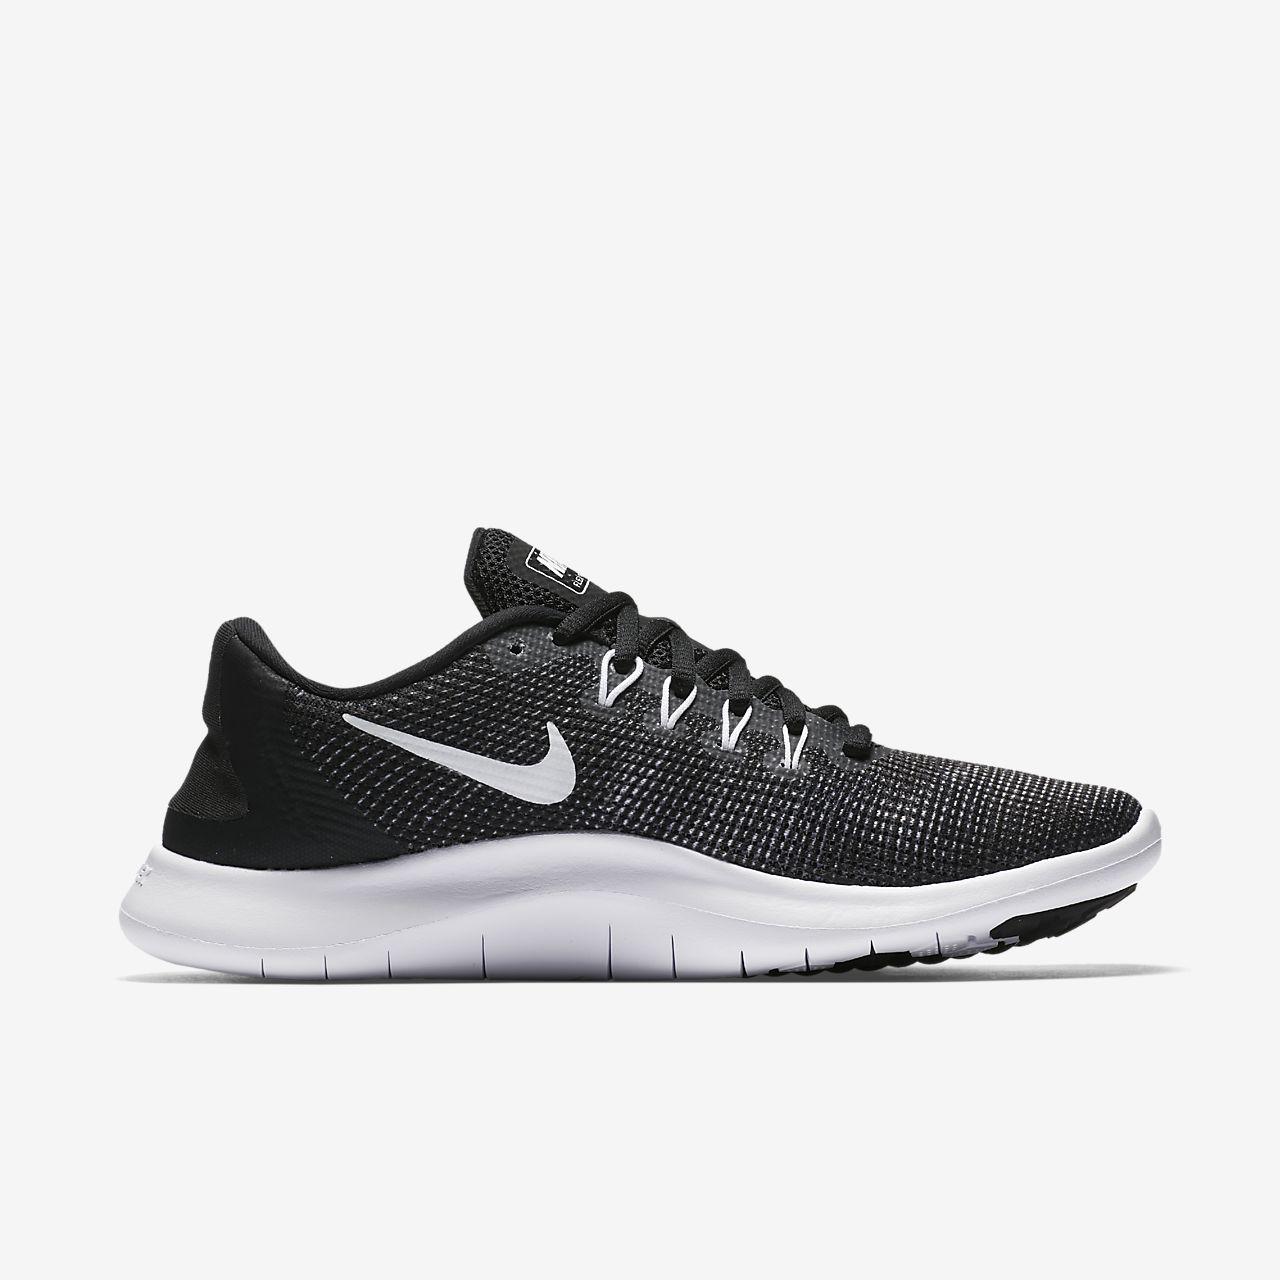 Nike Flex RN 2018 Shoes $37 Shipped